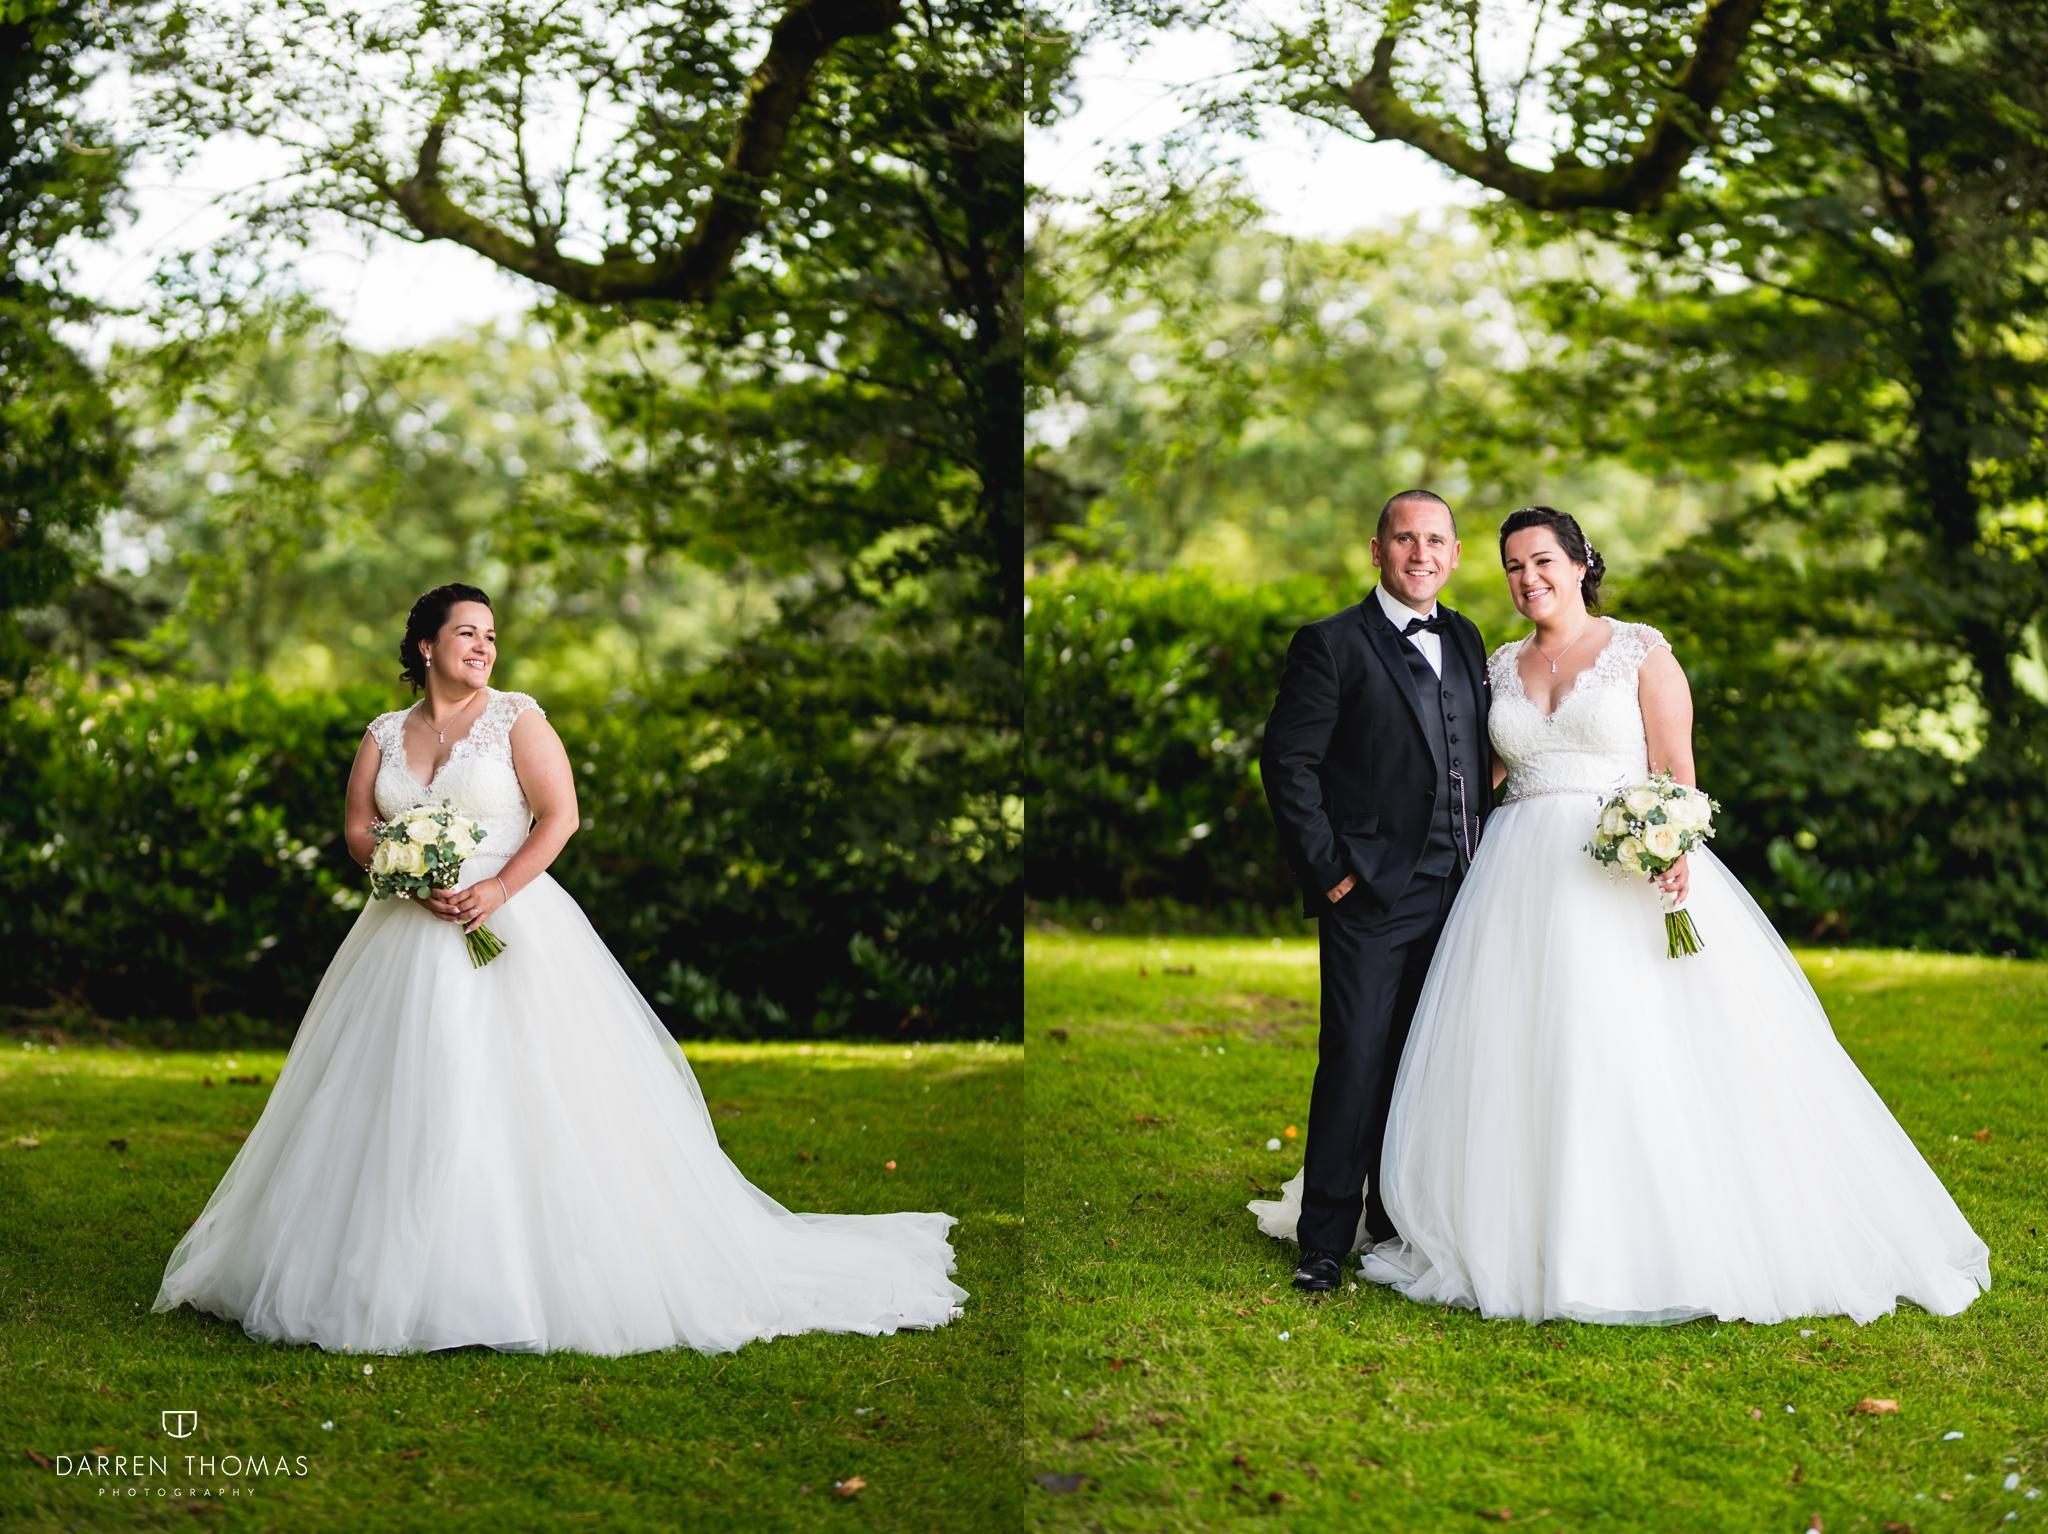 Llechwen-hall-wedding-photography13.jpg